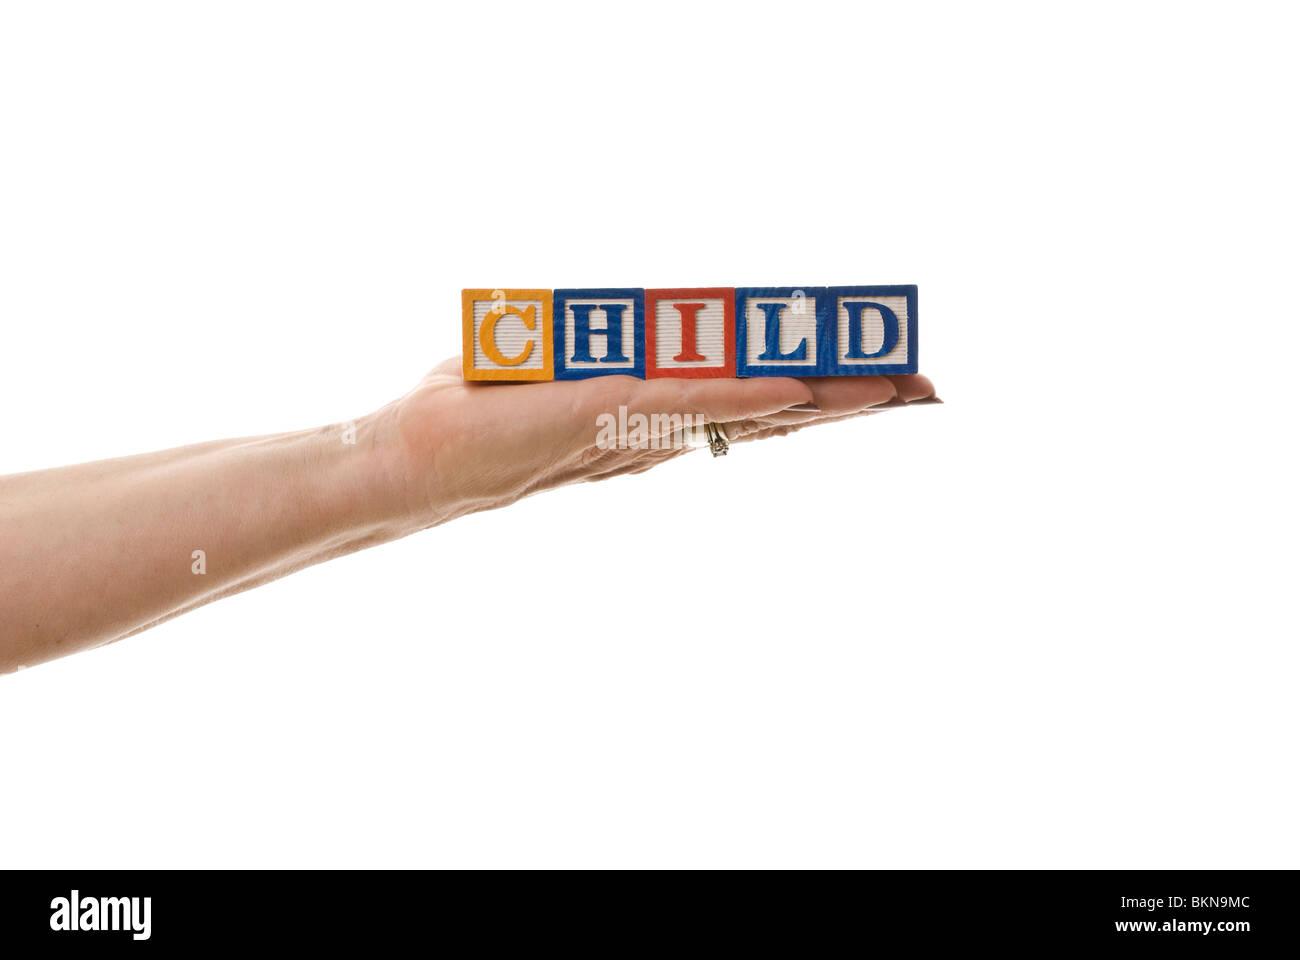 Woman holding children's blocks that spell 'CHILD' - Stock Image